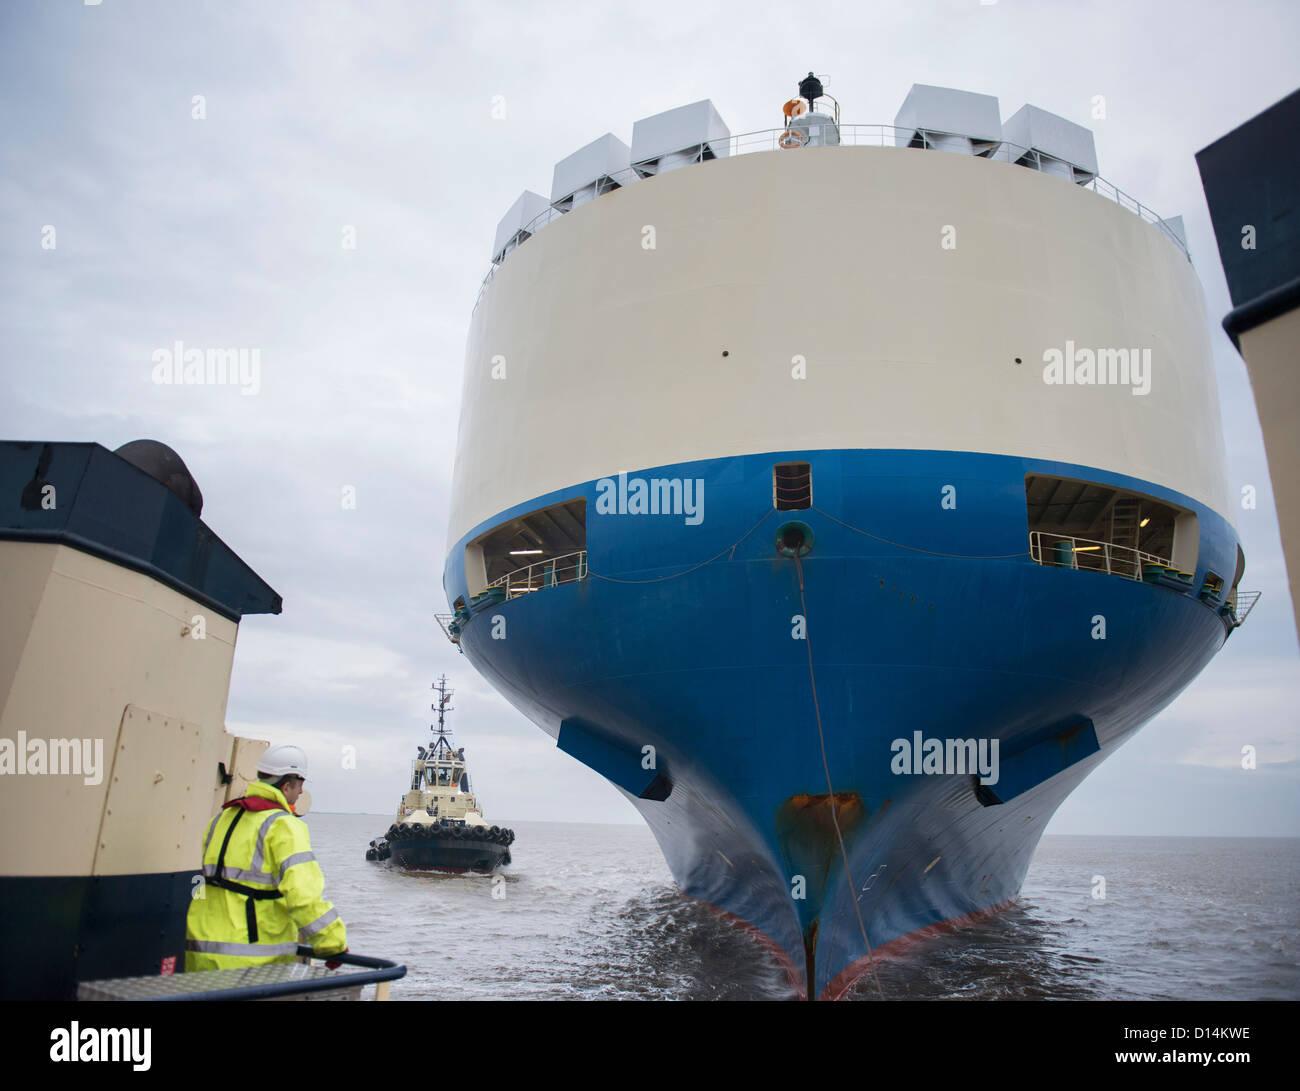 Tugboat sailing by large ship - Stock Image